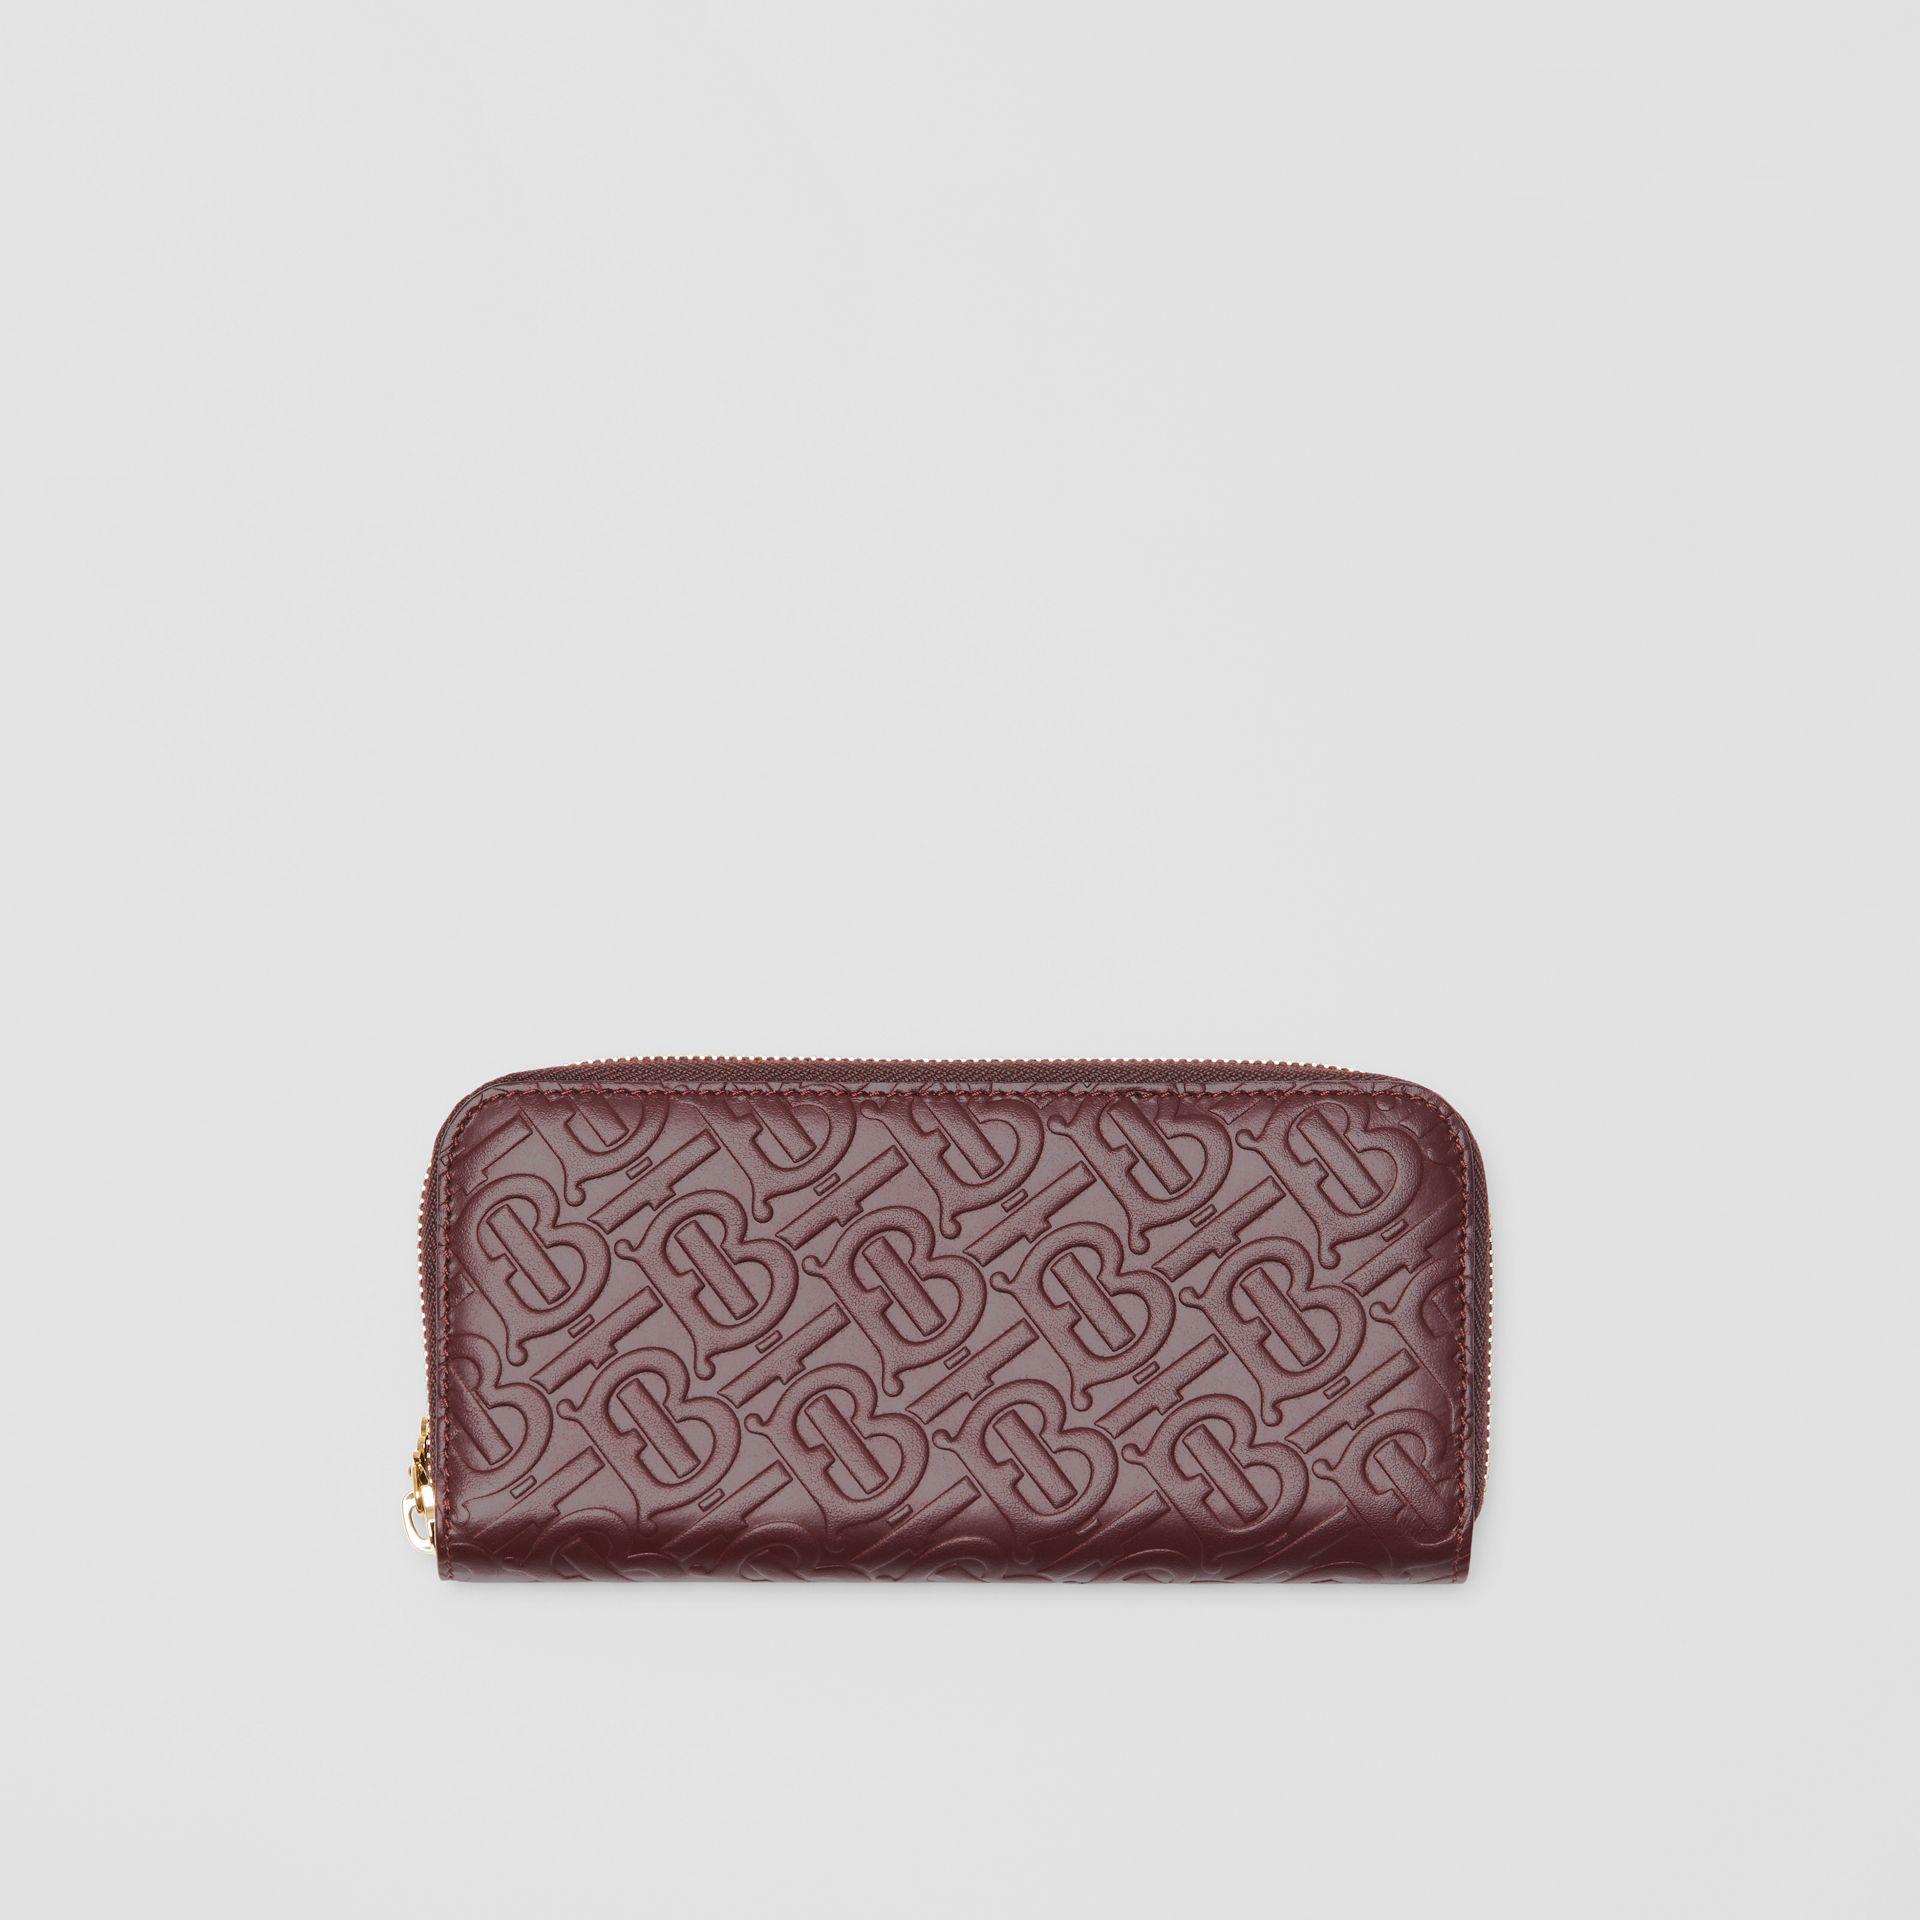 Burberry Monogram Leather Ziparound Wallet In Oxblood